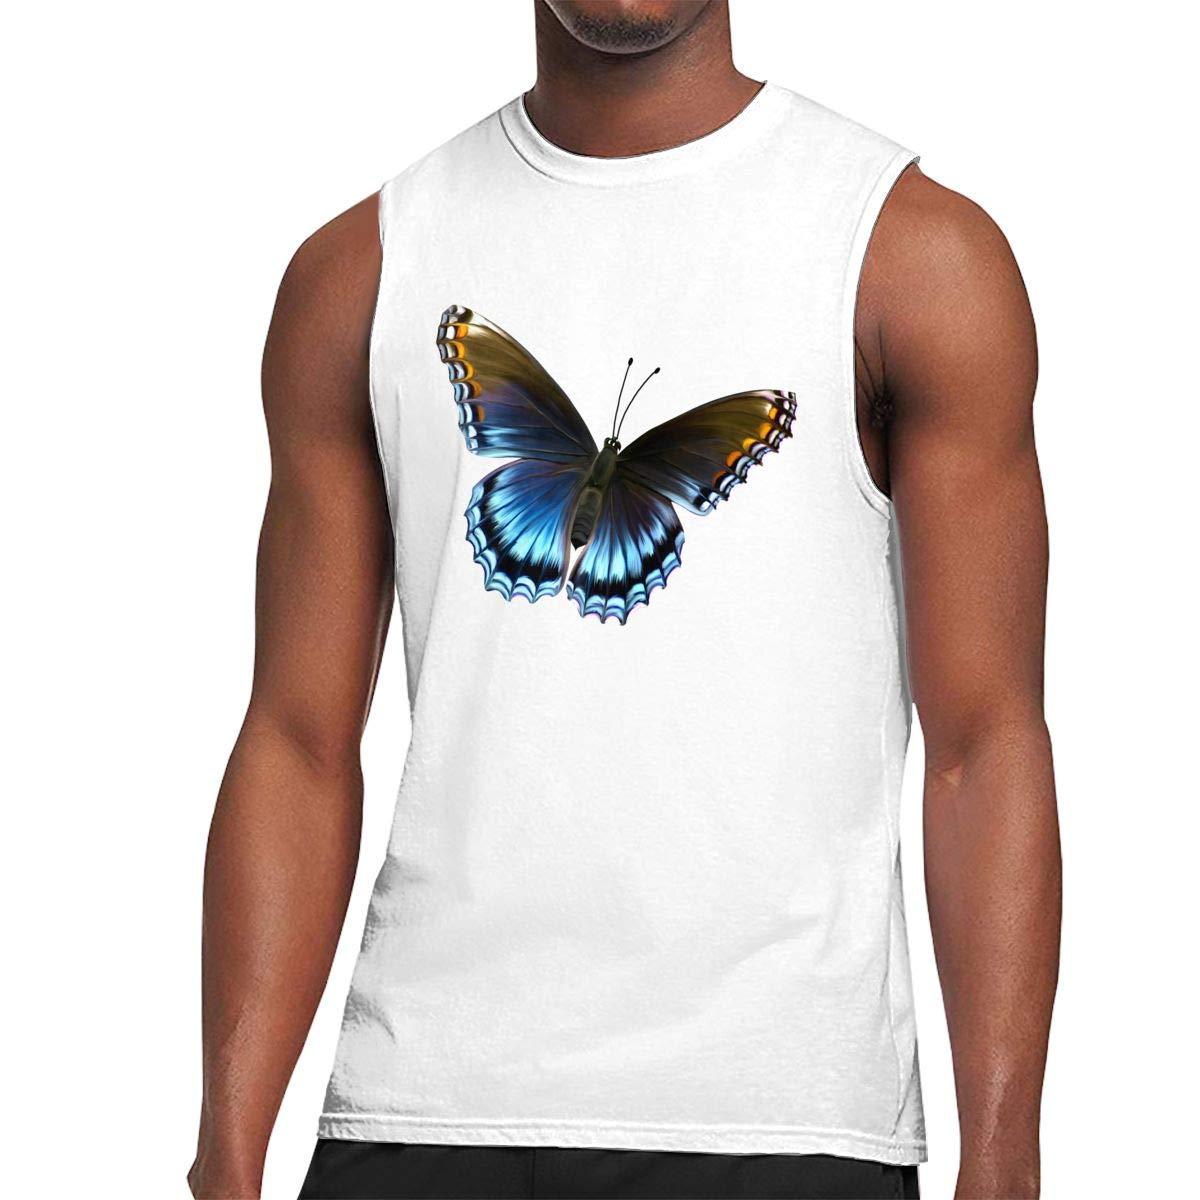 Muscle Tank Top Softball Butterfly Gym Training Tech Running Activewear 1825 Shirts